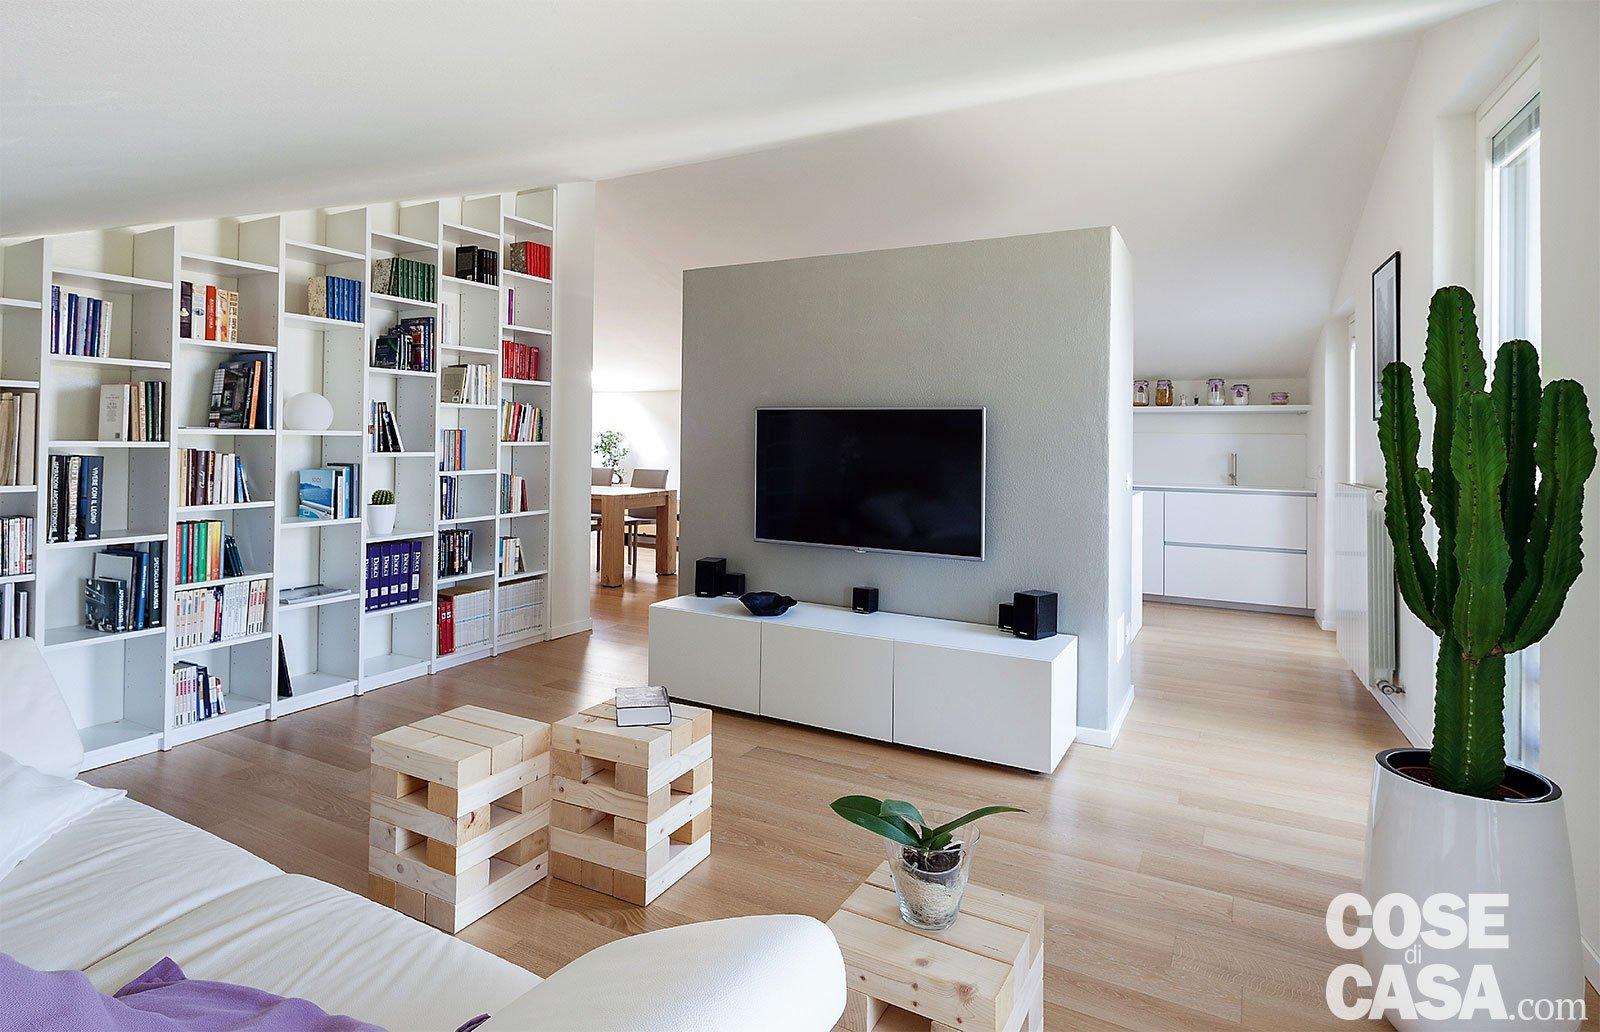 Abitare in mansarda cose di casa for Arredare mansarda open space